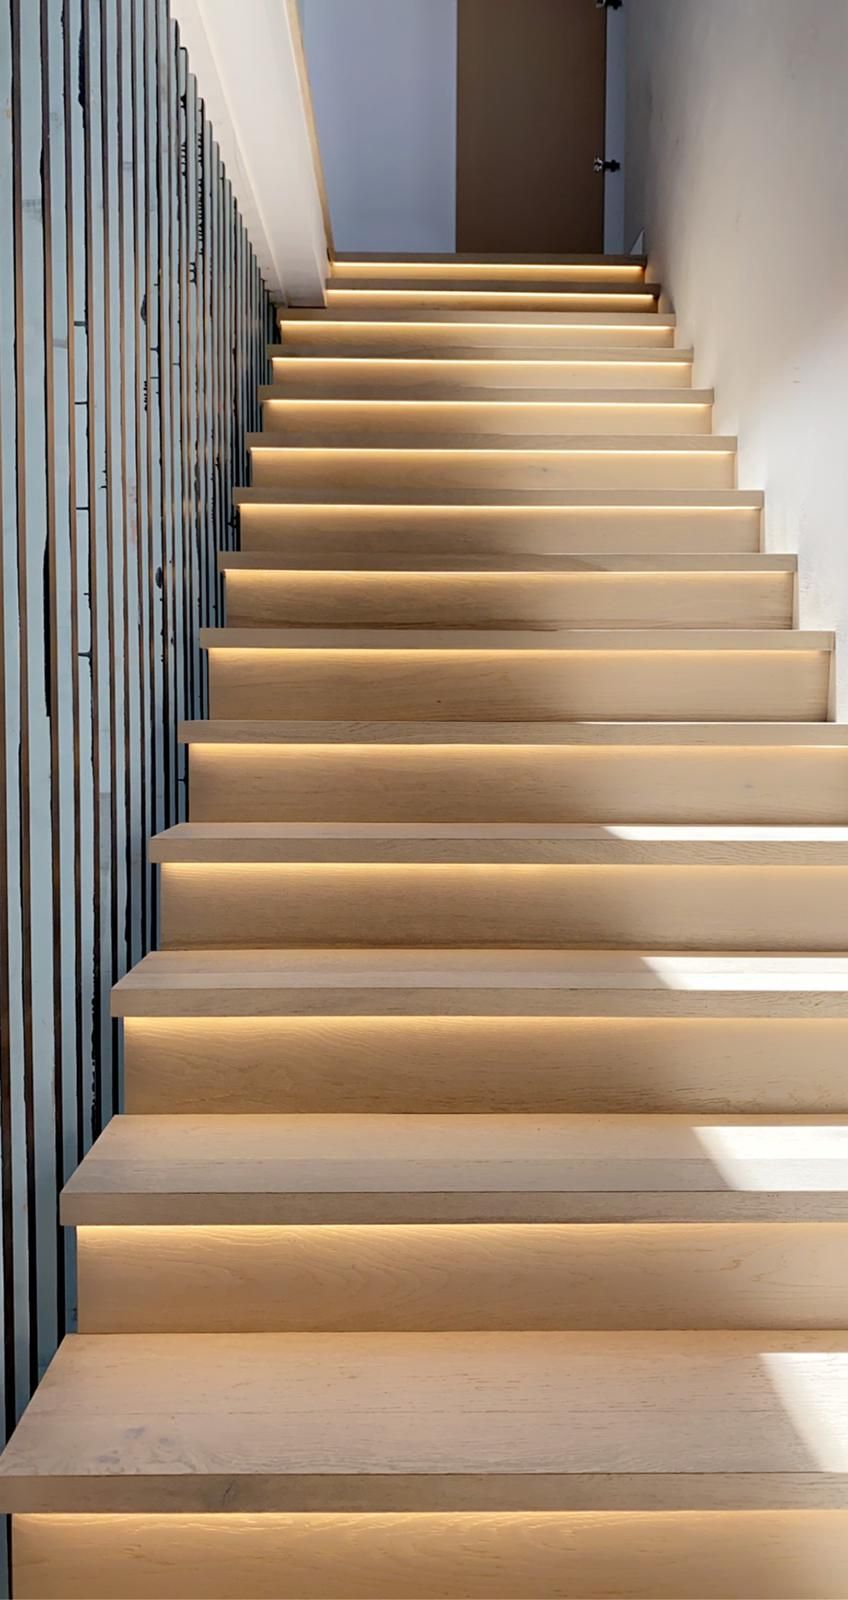 LED Strip lighting Stair LED lighting installer Sydney electrician local Parramatta and Moorebank